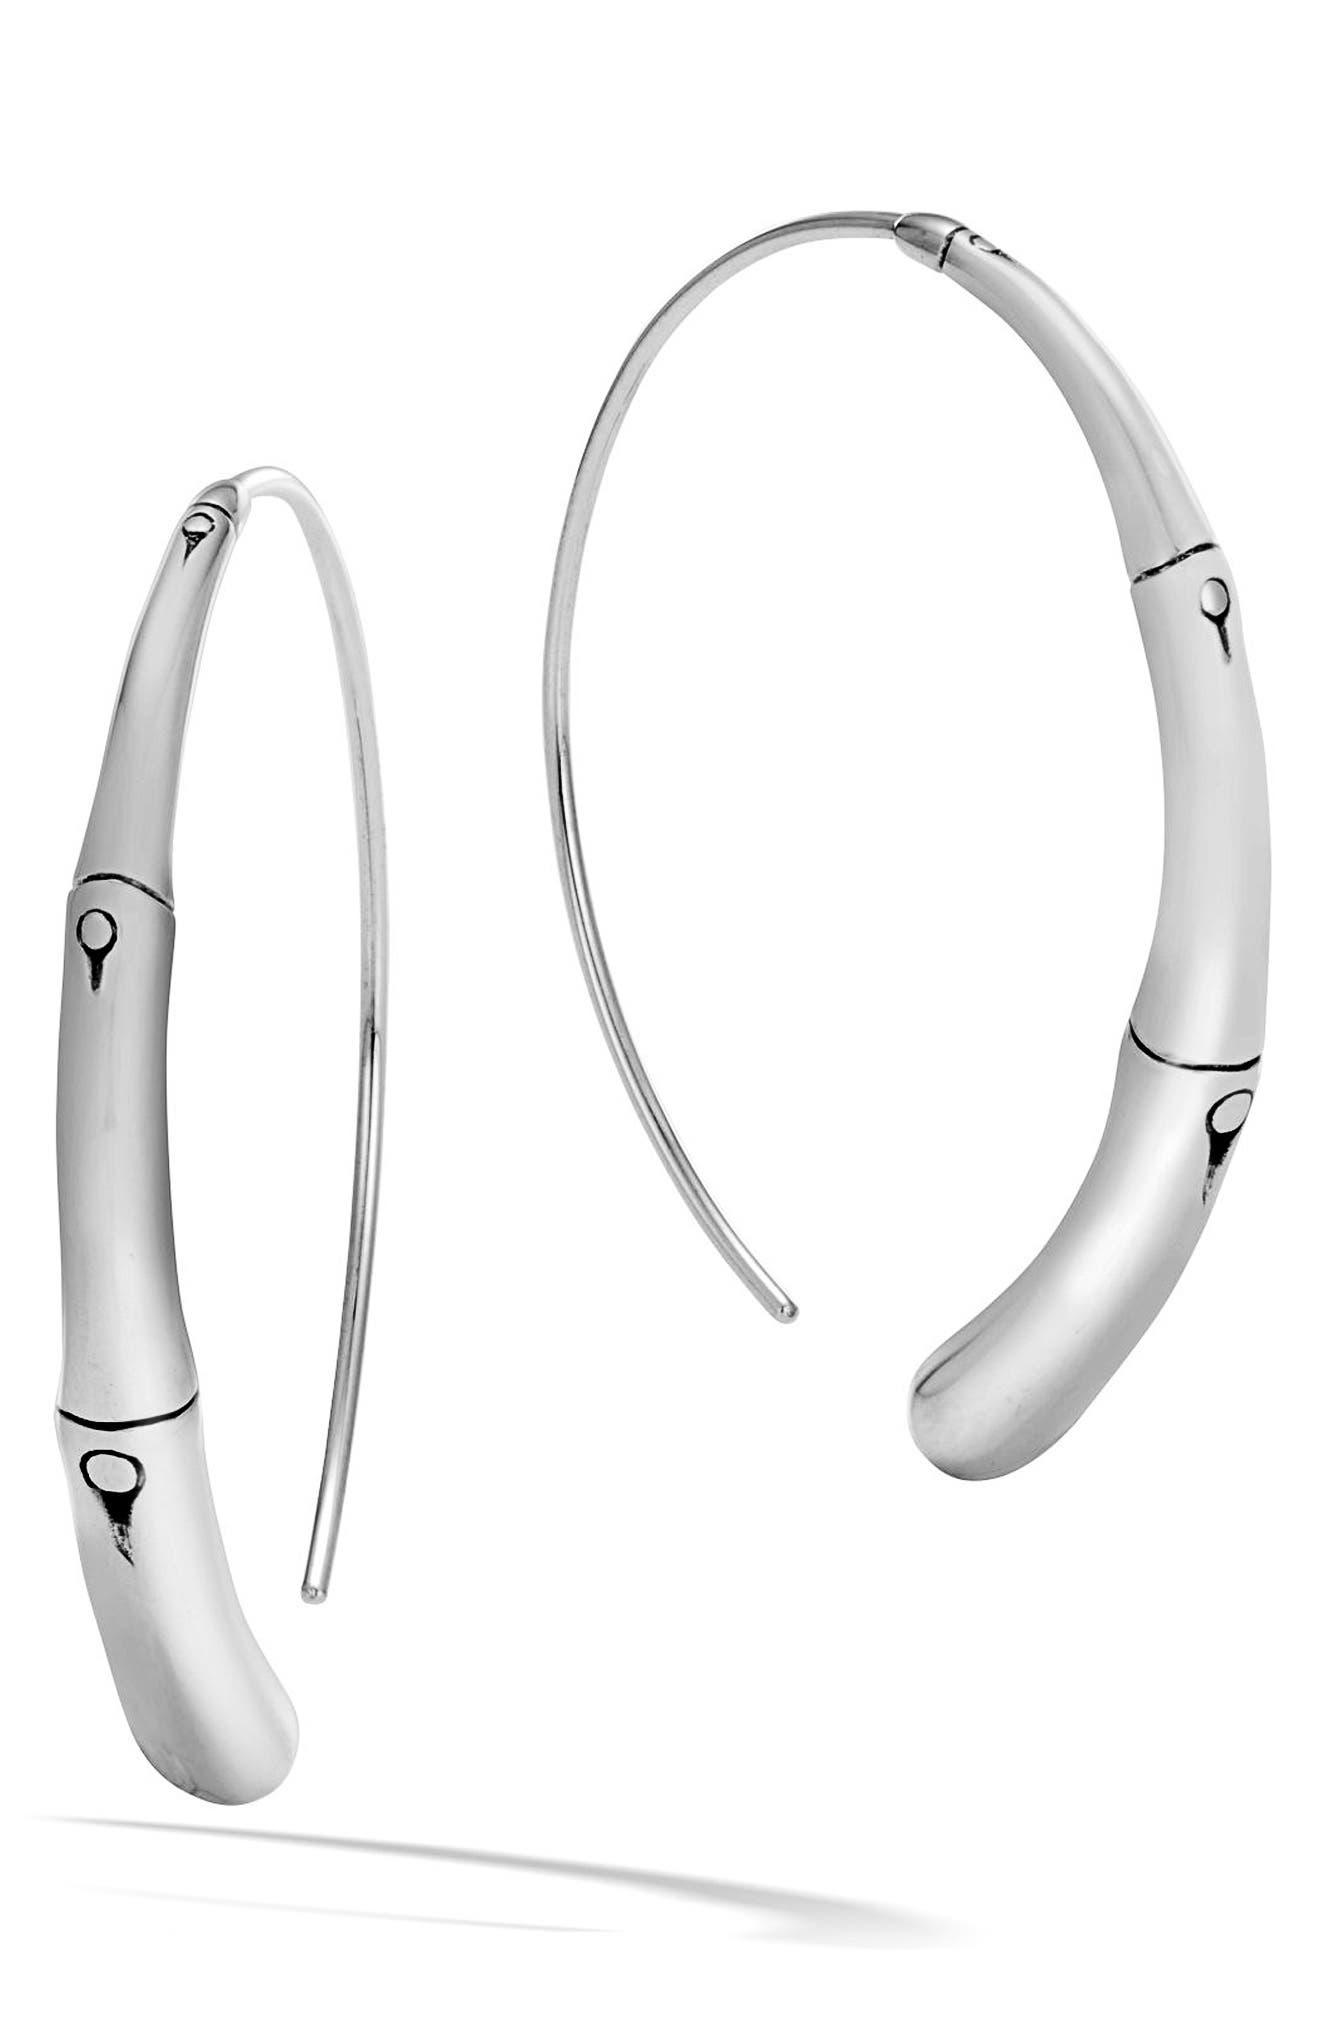 JOHN HARDY, Bamboo Large Hoop Earrings, Main thumbnail 1, color, SILVER